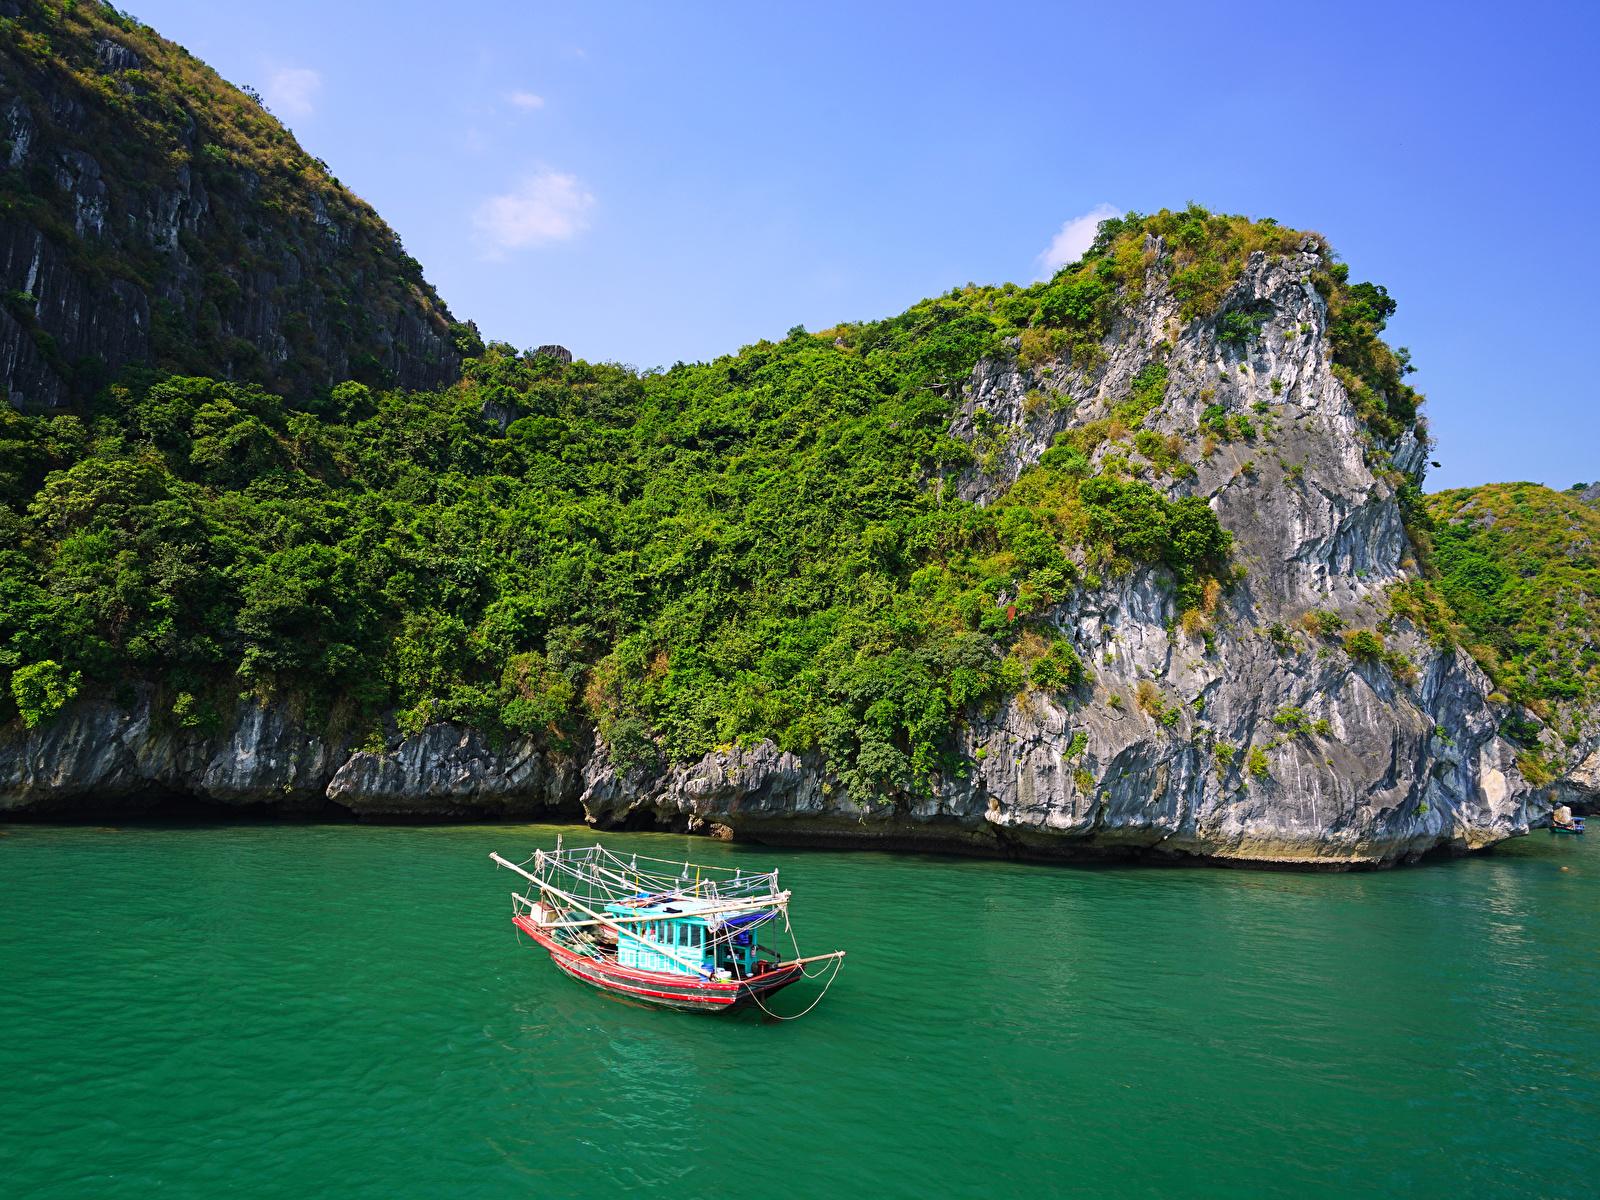 Картинка Вьетнам Lan Ha Bay Скала Природа корабль заливы Катера 1600x1200 Утес скалы скале Корабли Залив залива